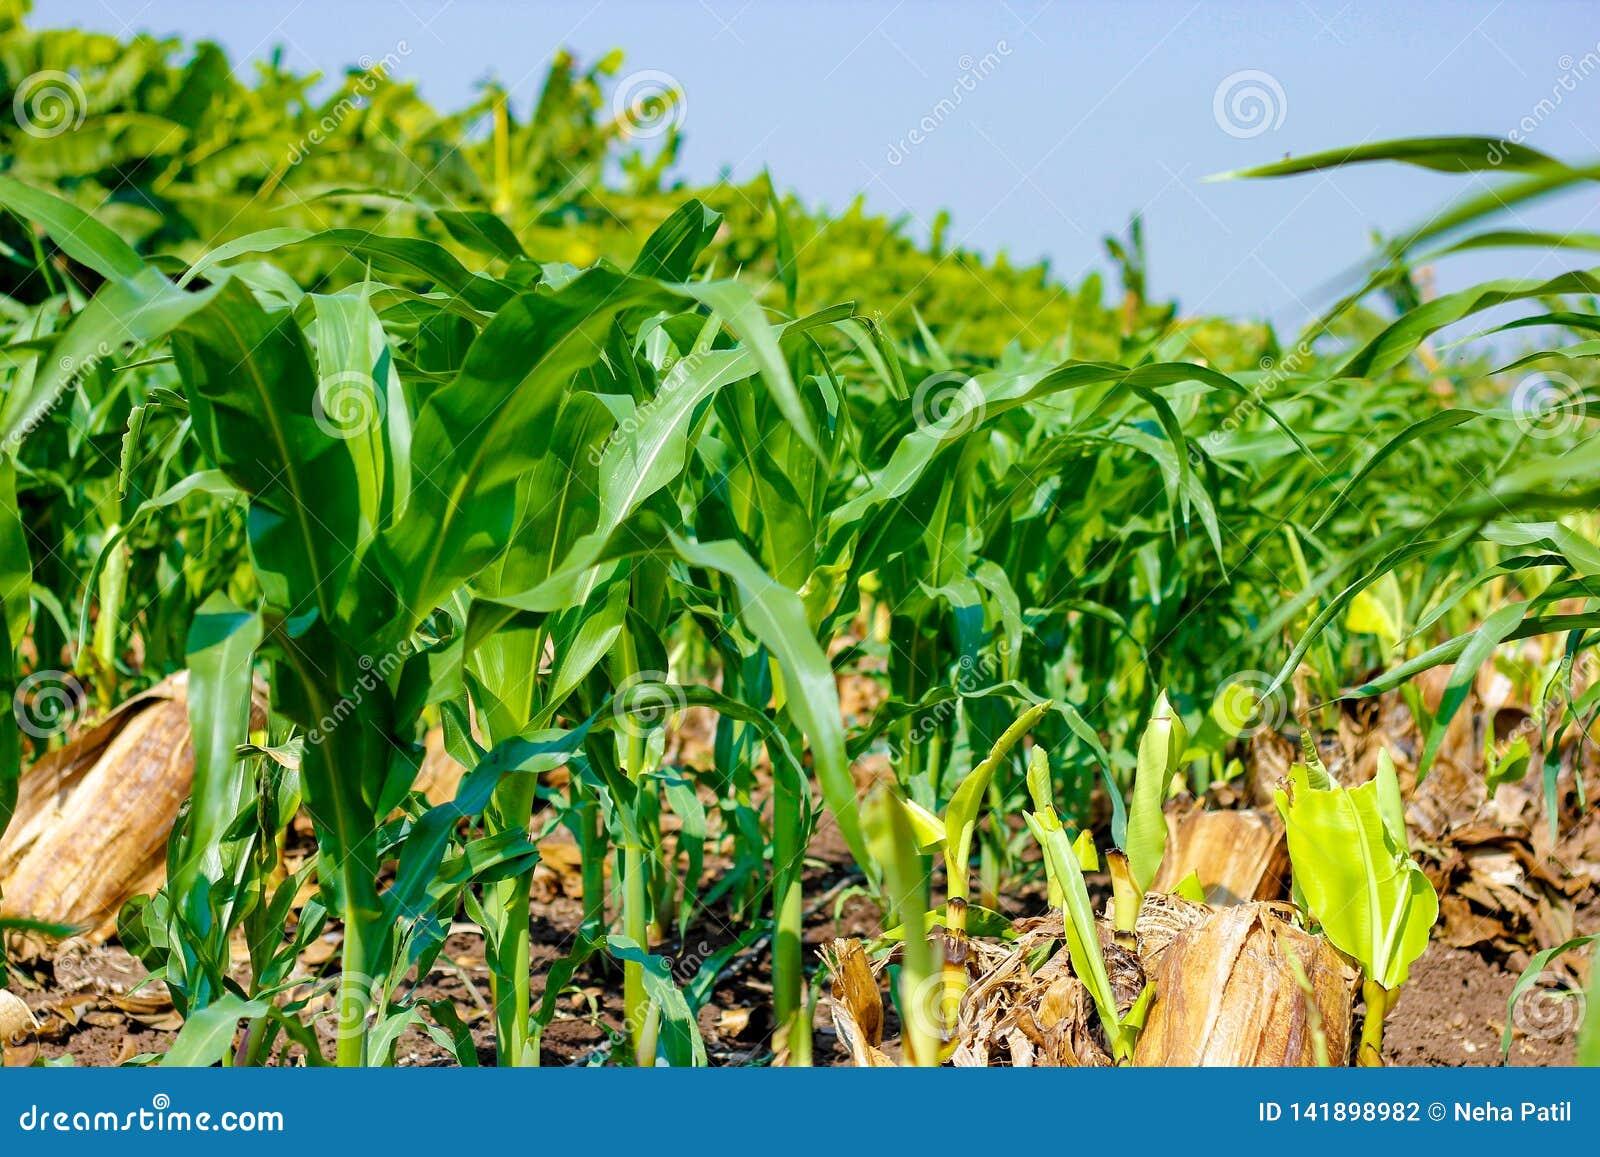 Campo de maíz verde verde fresco, granja india,